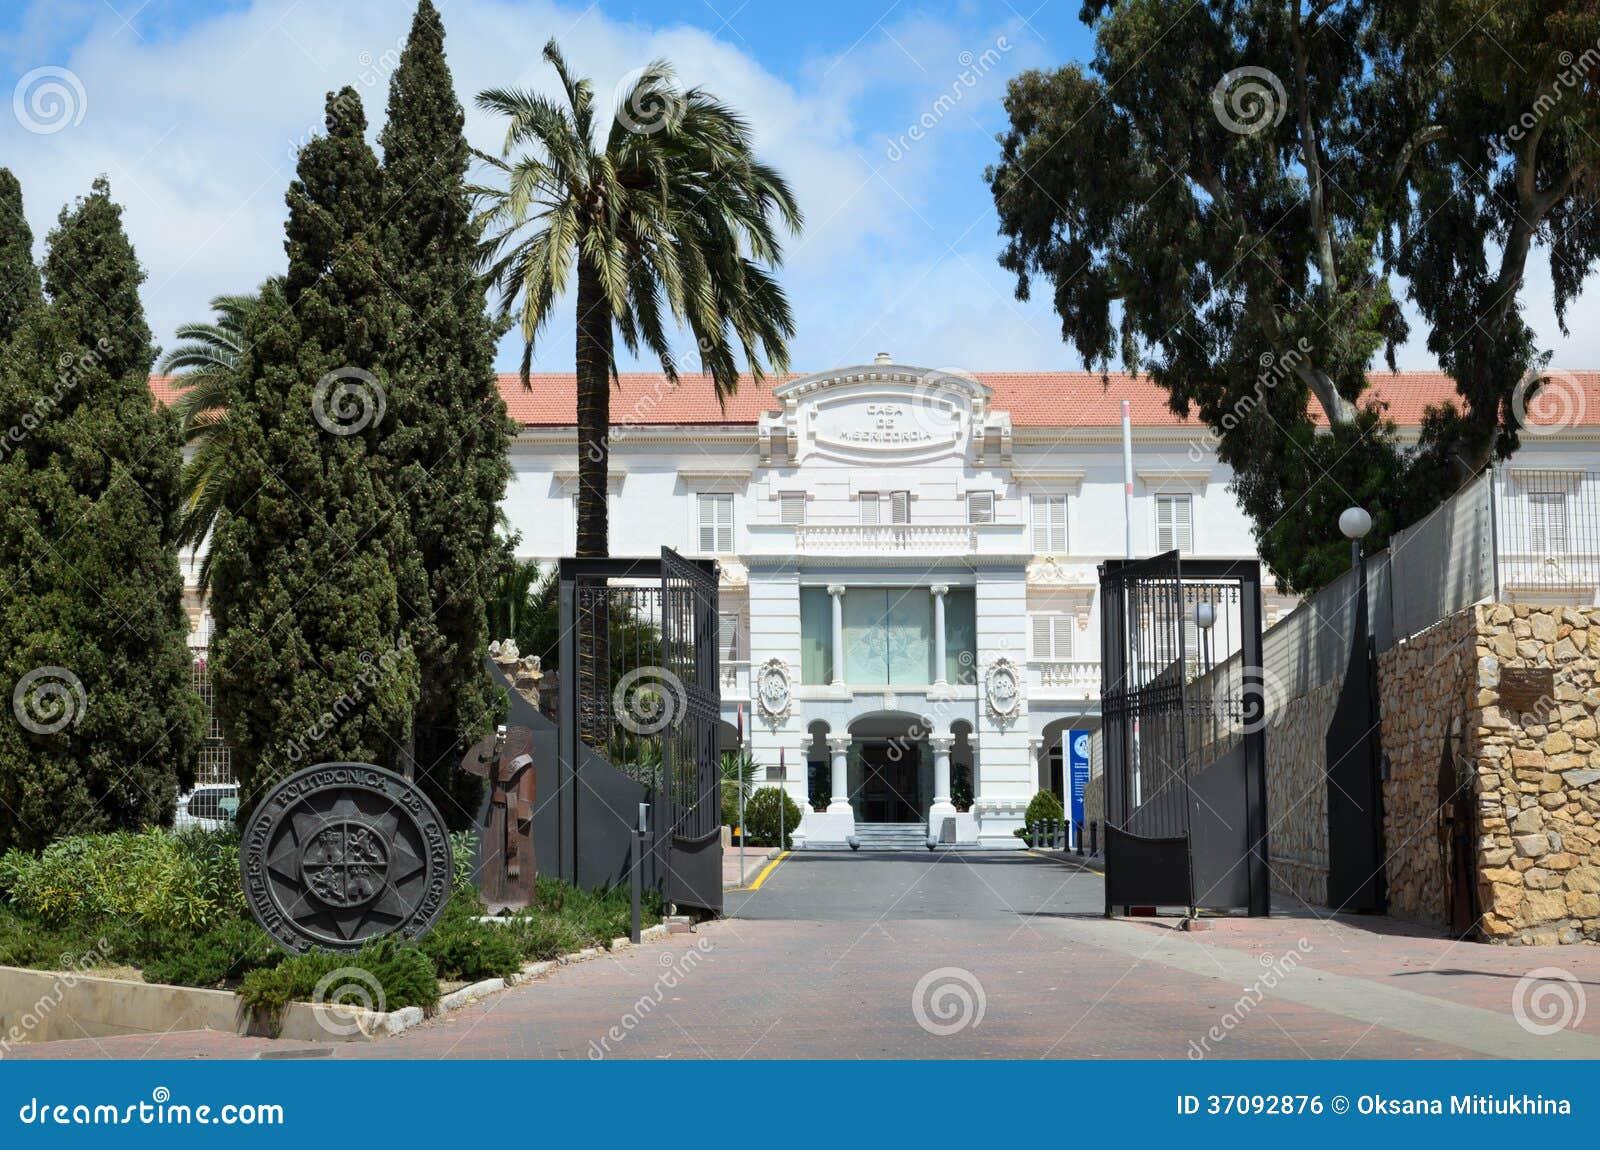 Technical University Of Cartagena Royalty Free Stock Image